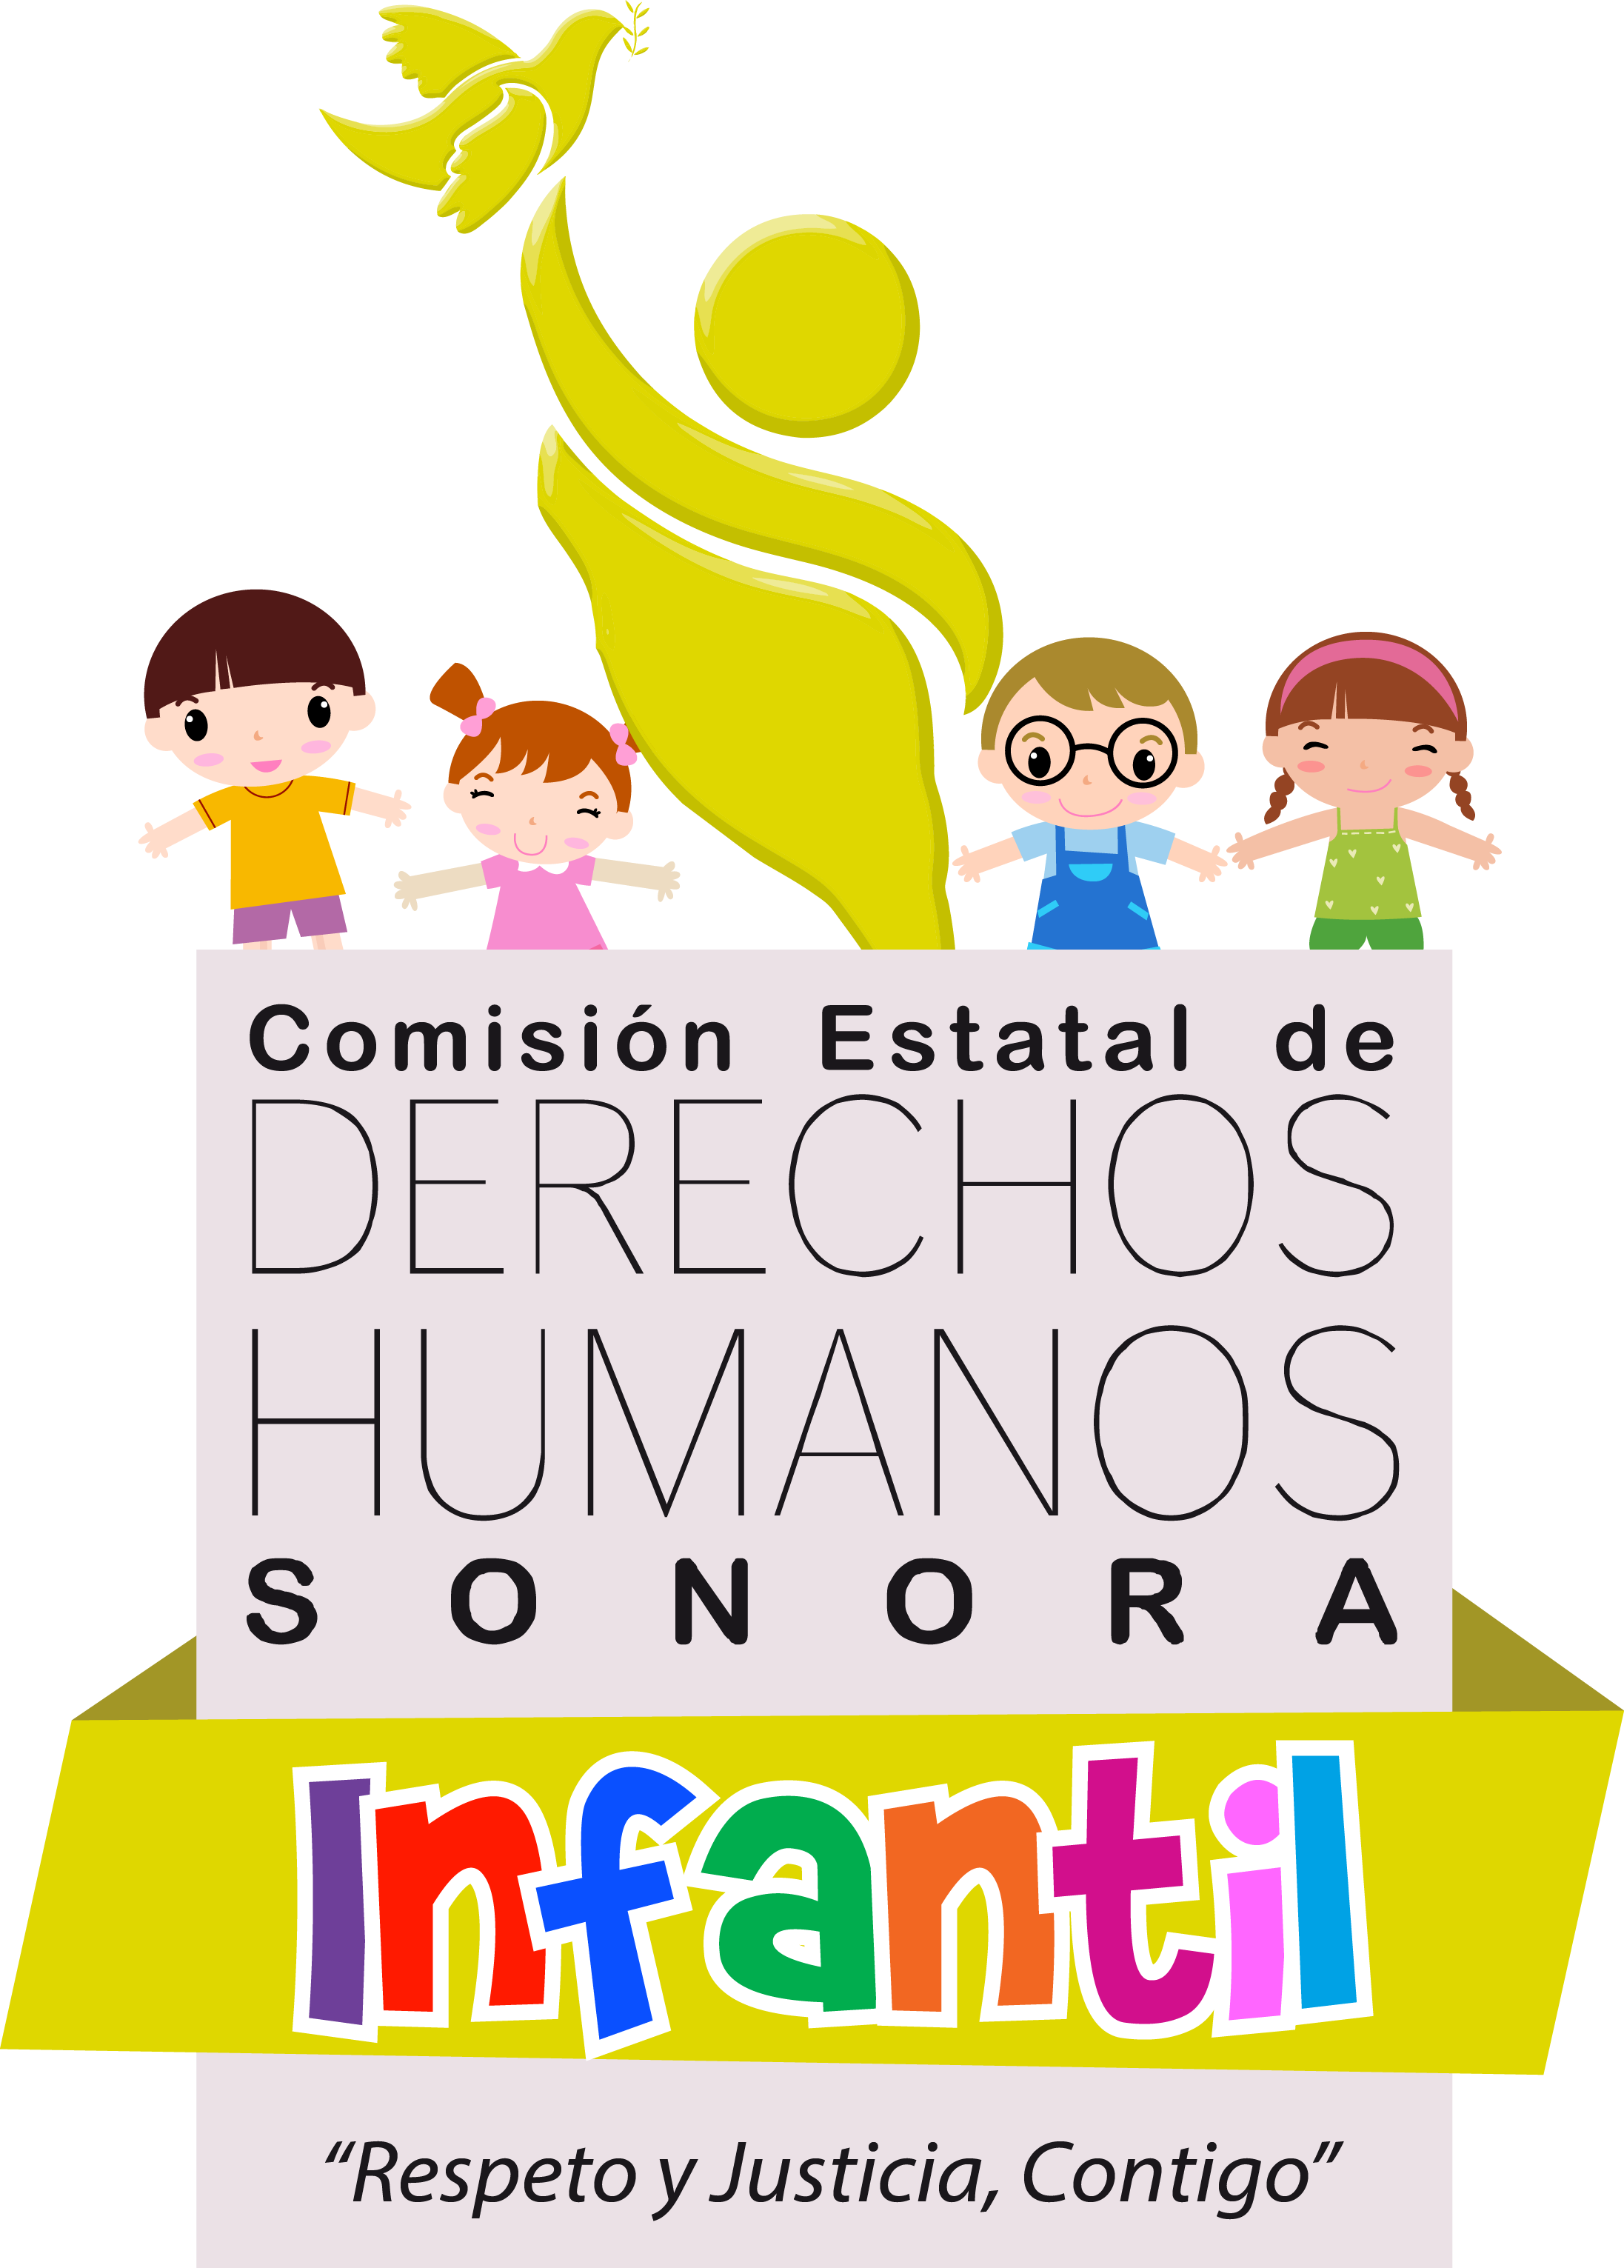 Humano Png Derechos Humanos 5ta.png